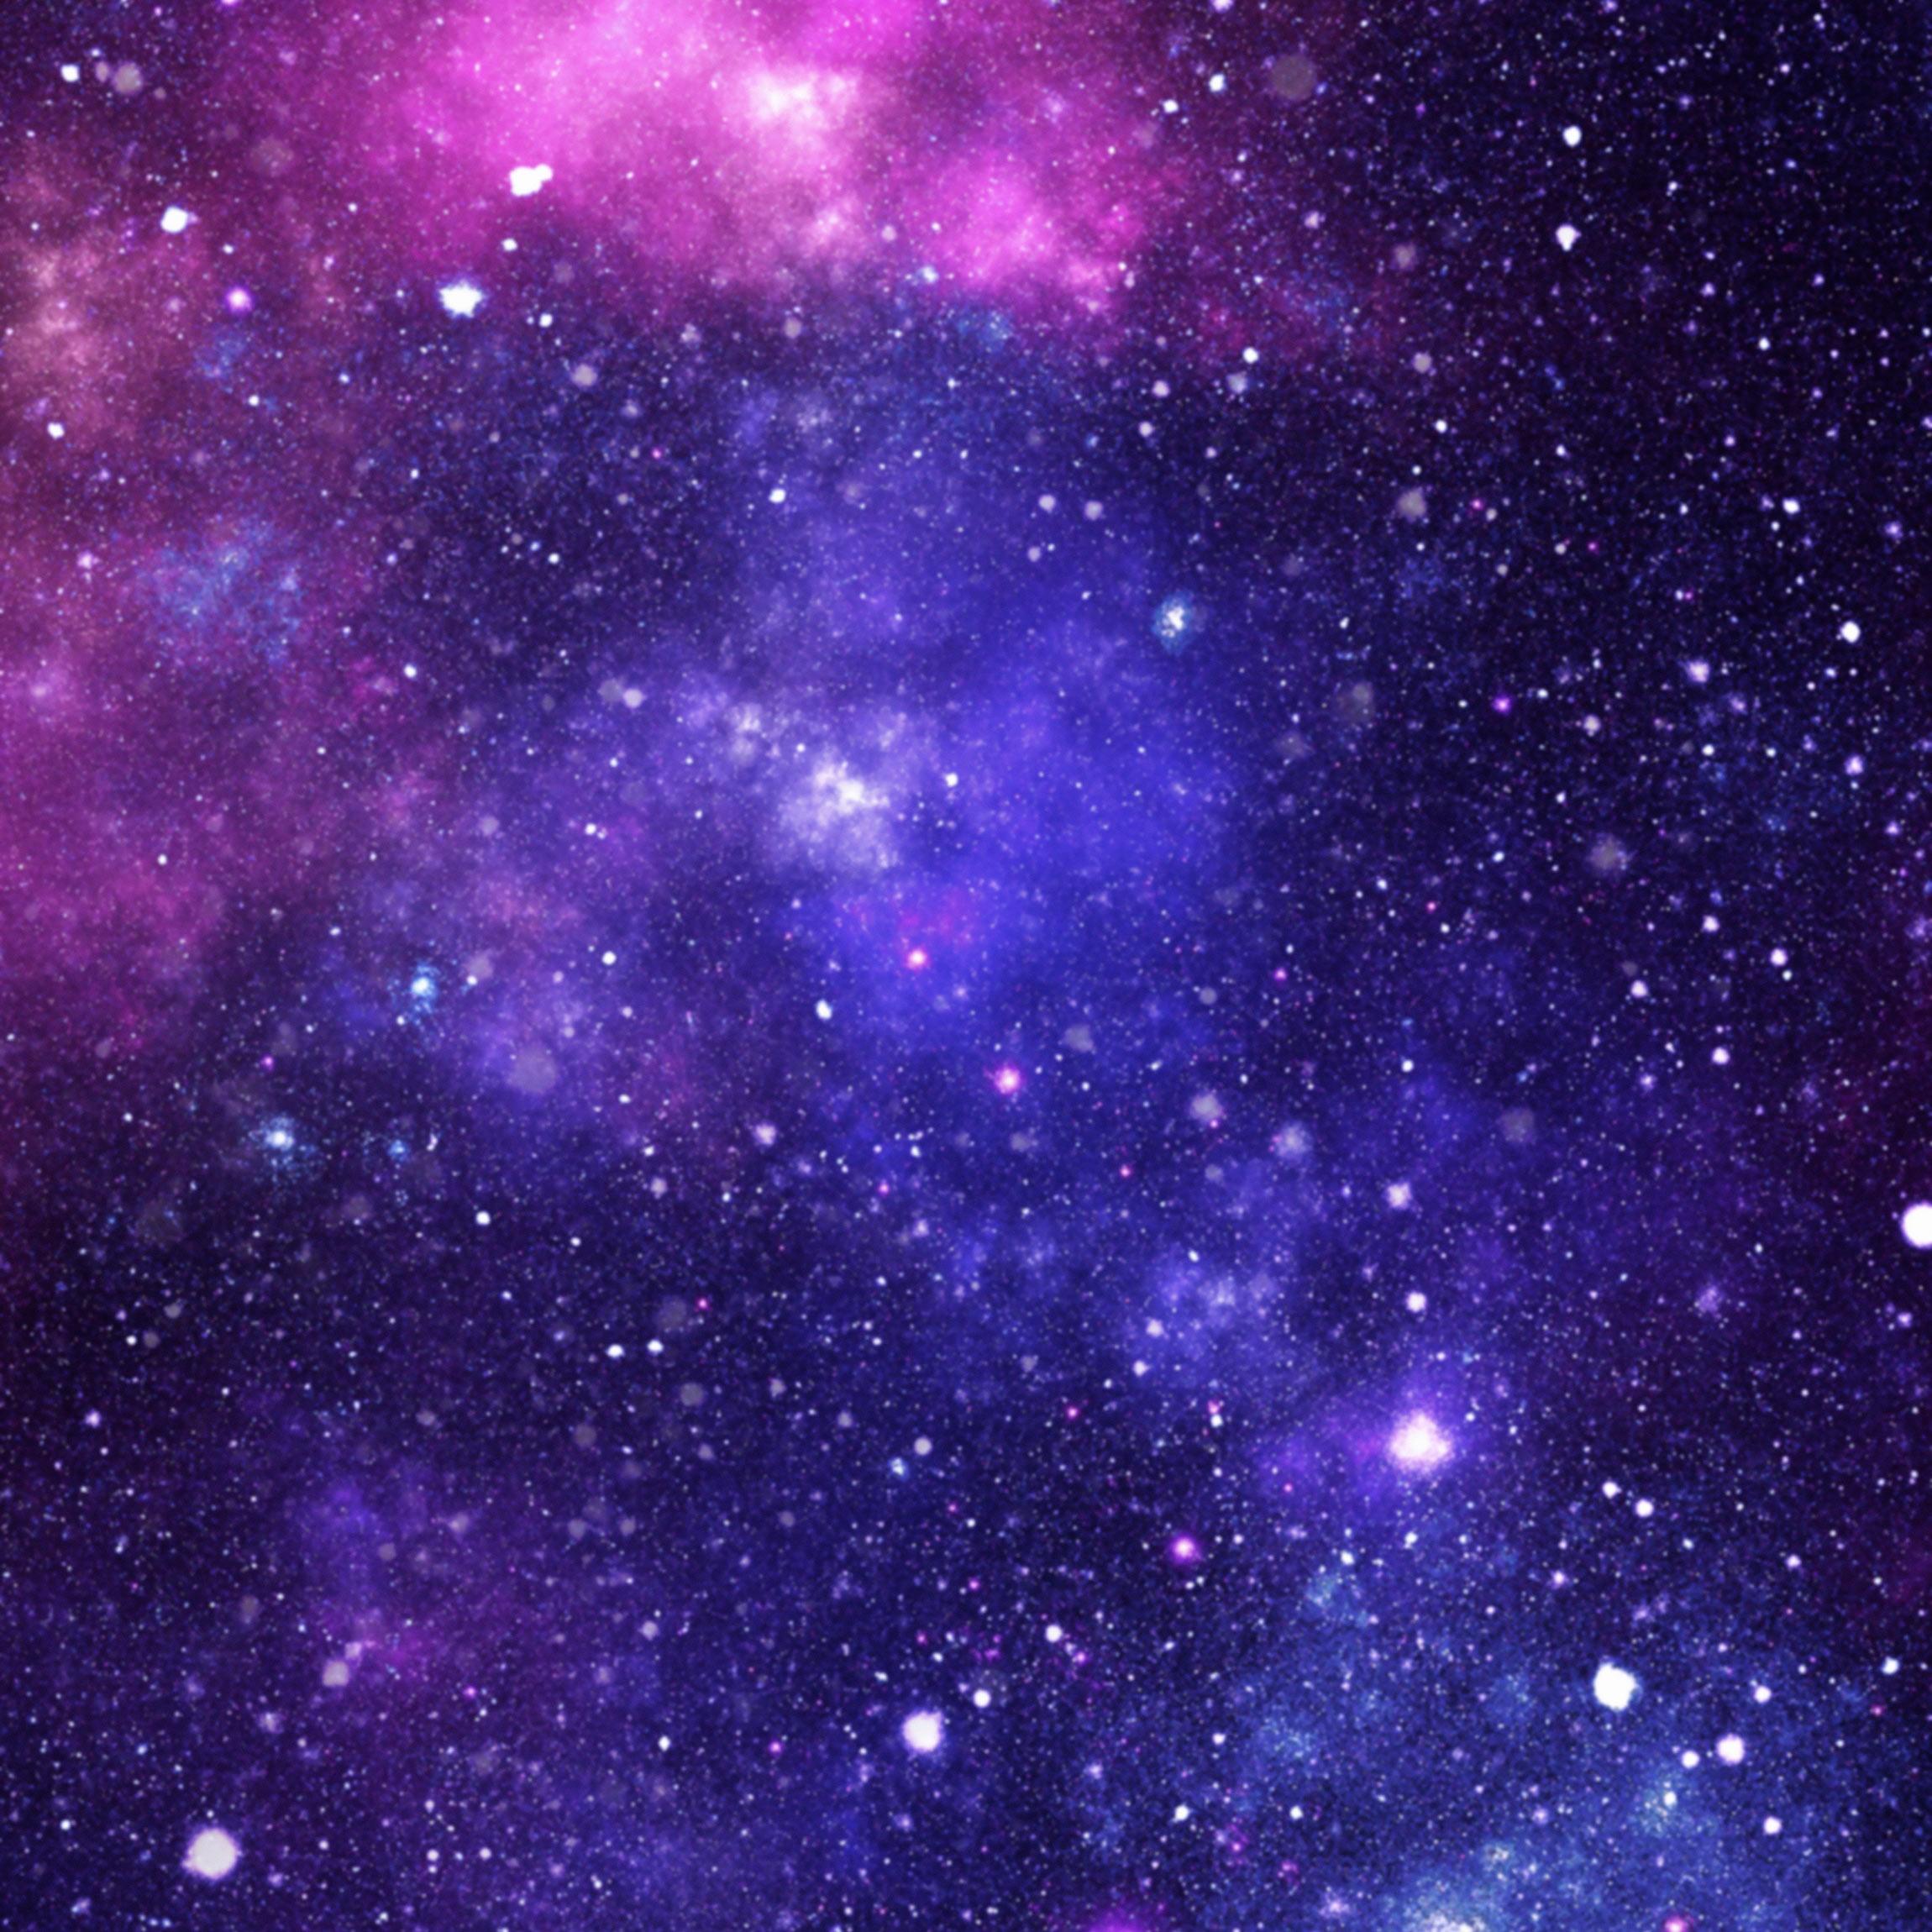 Galaxy Bilder